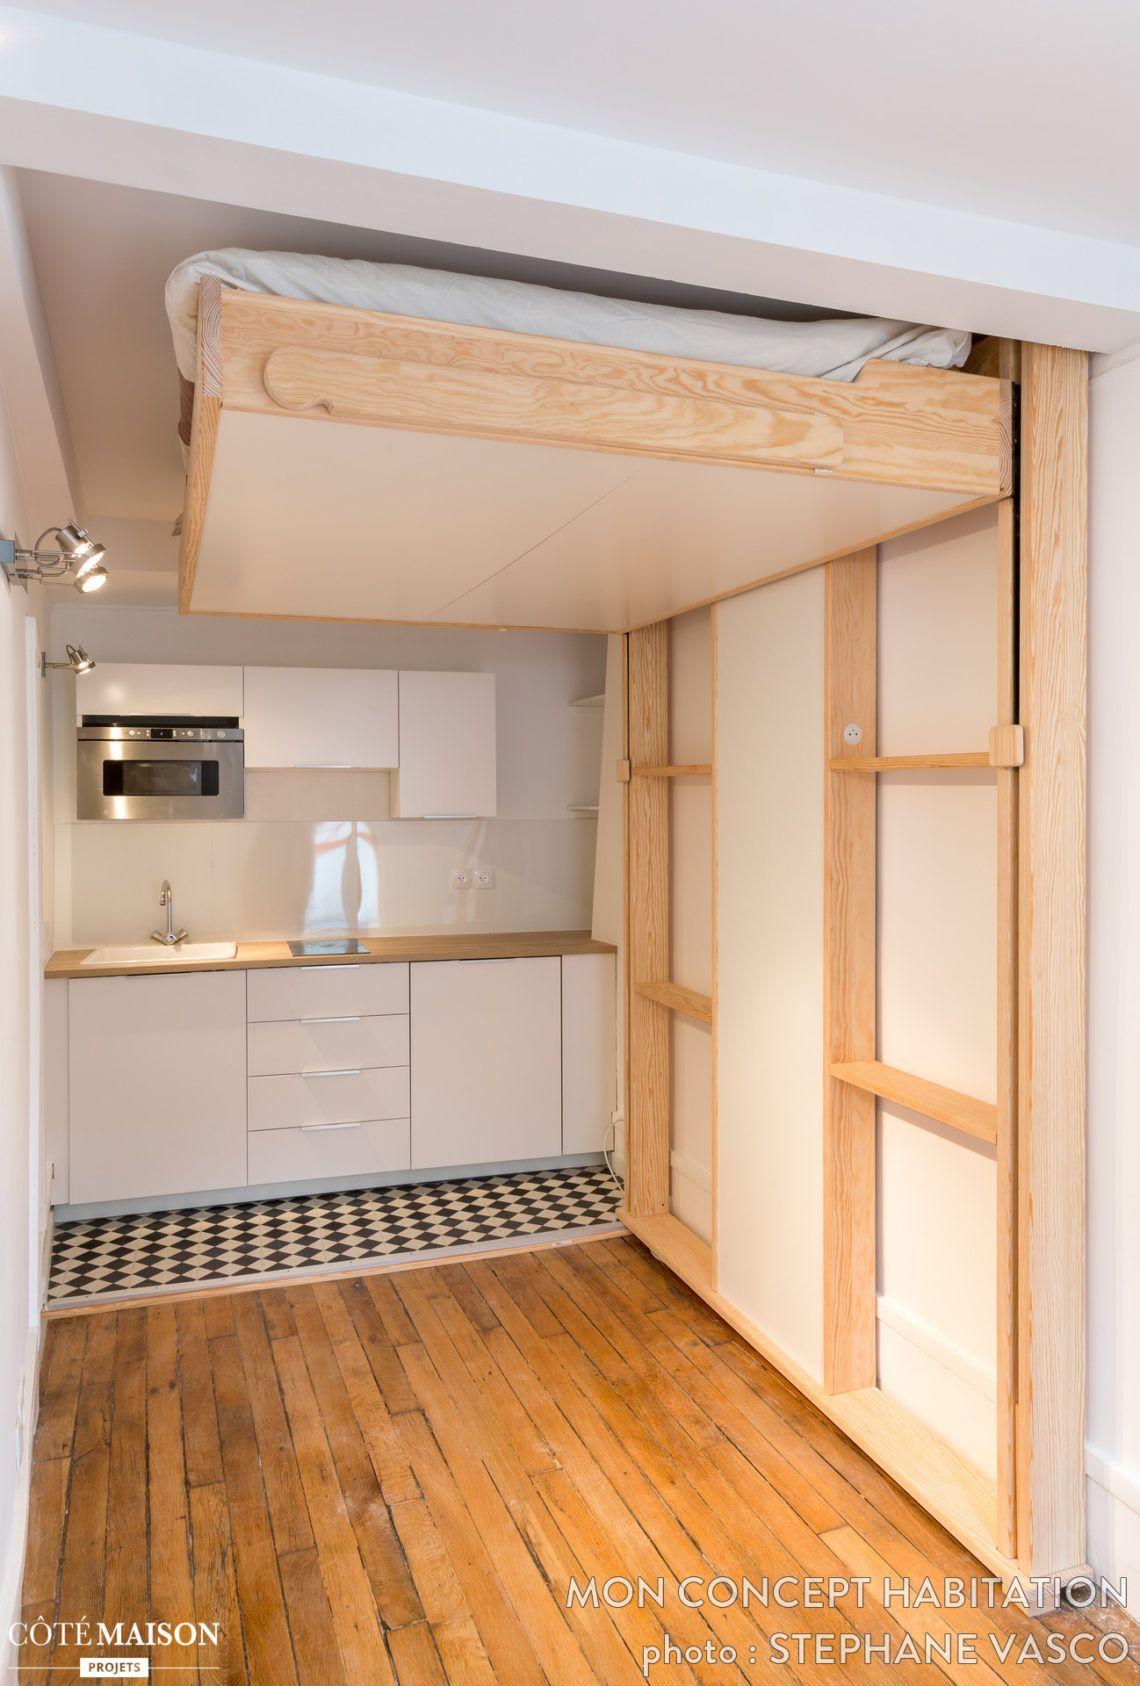 I hacked an extra bunk under the IKEA KURA double bunk bed